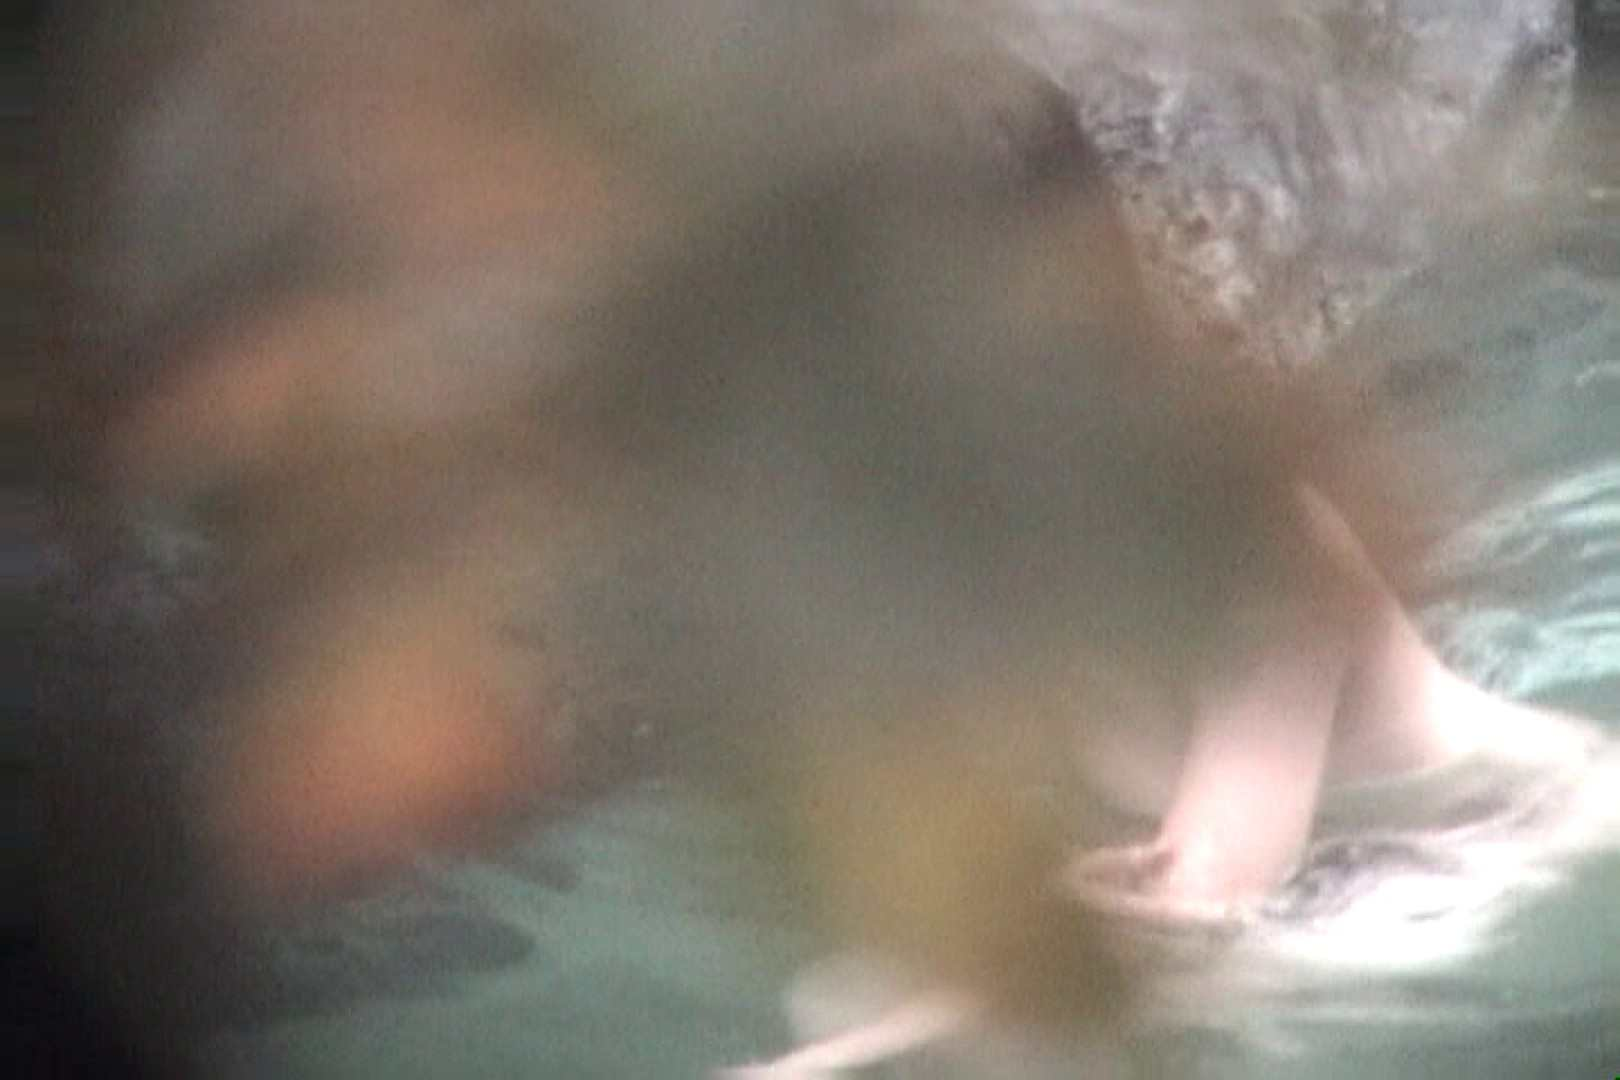 Aquaな露天風呂Vol.71【VIP限定】 OLエロ画像 覗きオメコ動画キャプチャ 68PICs 41